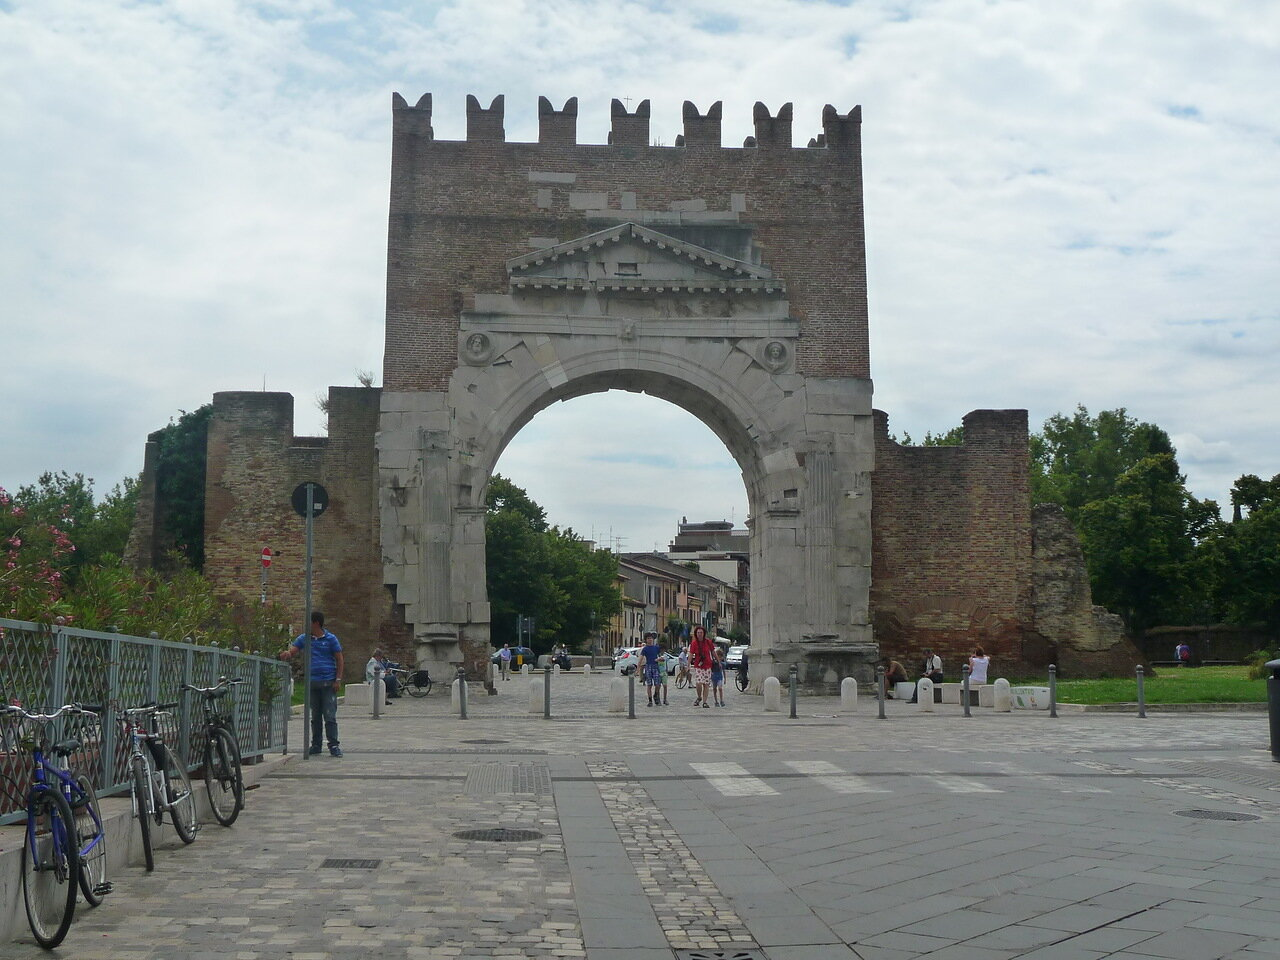 Знаменитая арка.